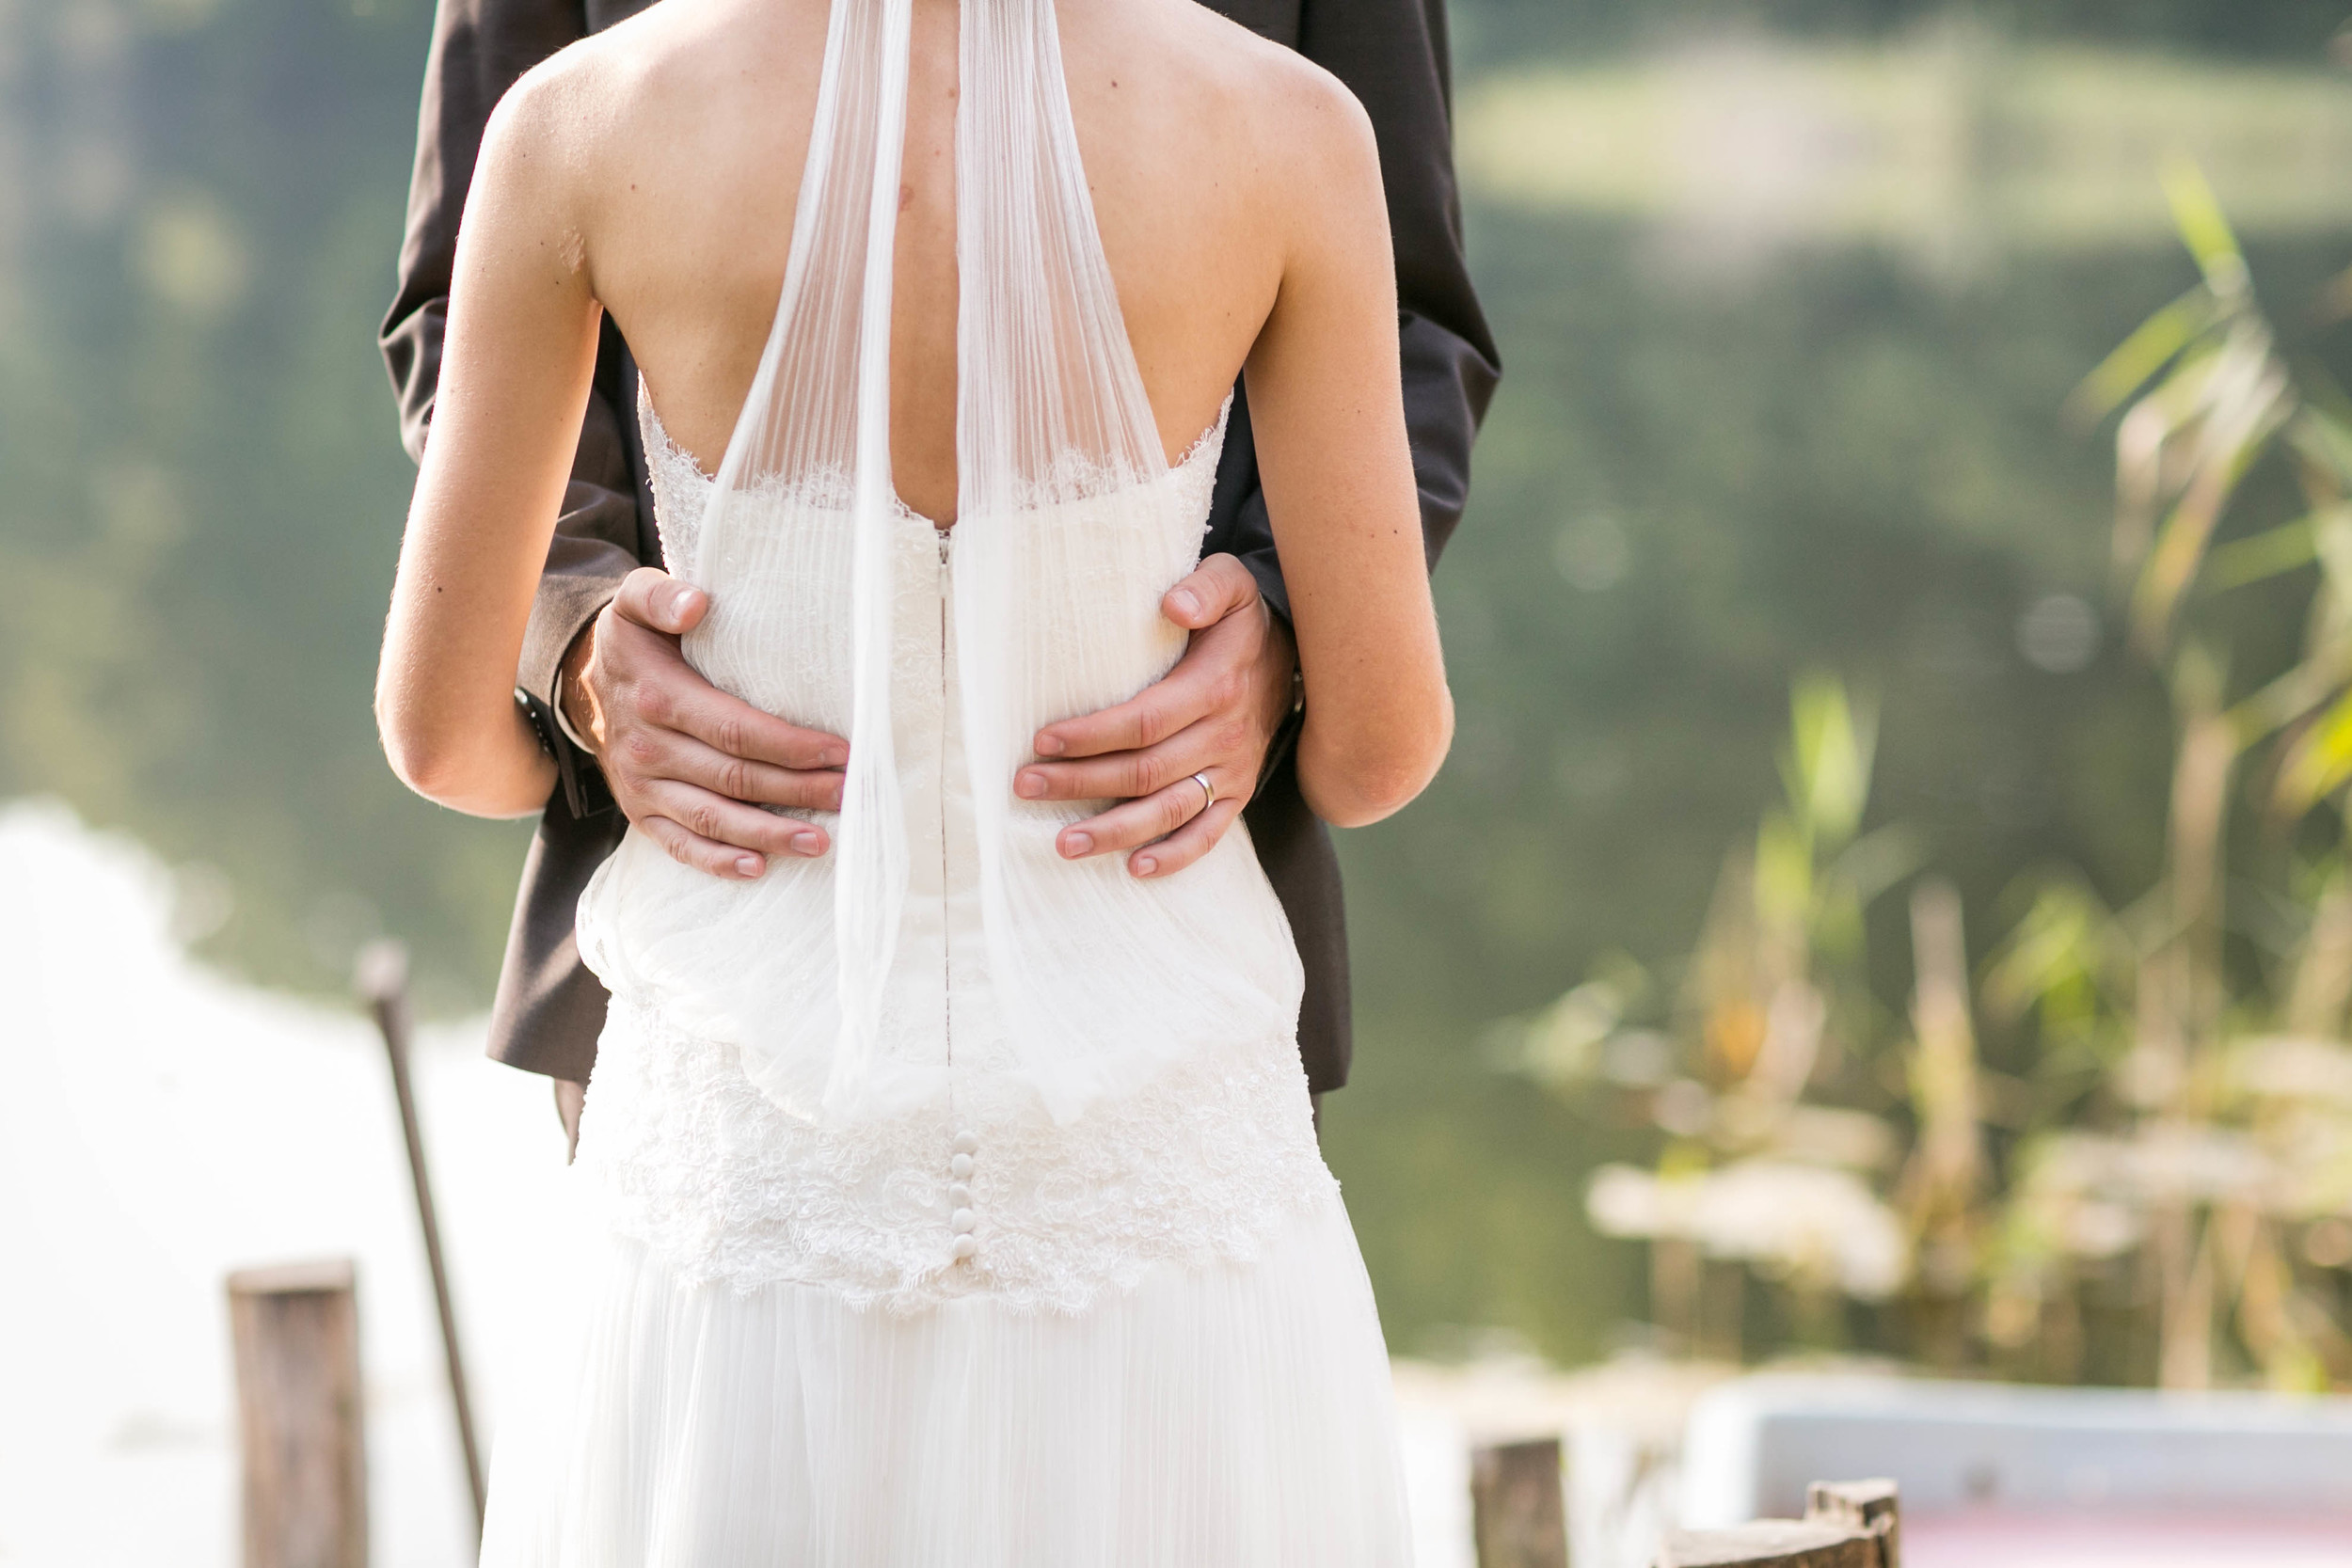 Fran Burrows Hochzeitsfotografie_Kulturgut Wrechen Hochzeit-67.jpg